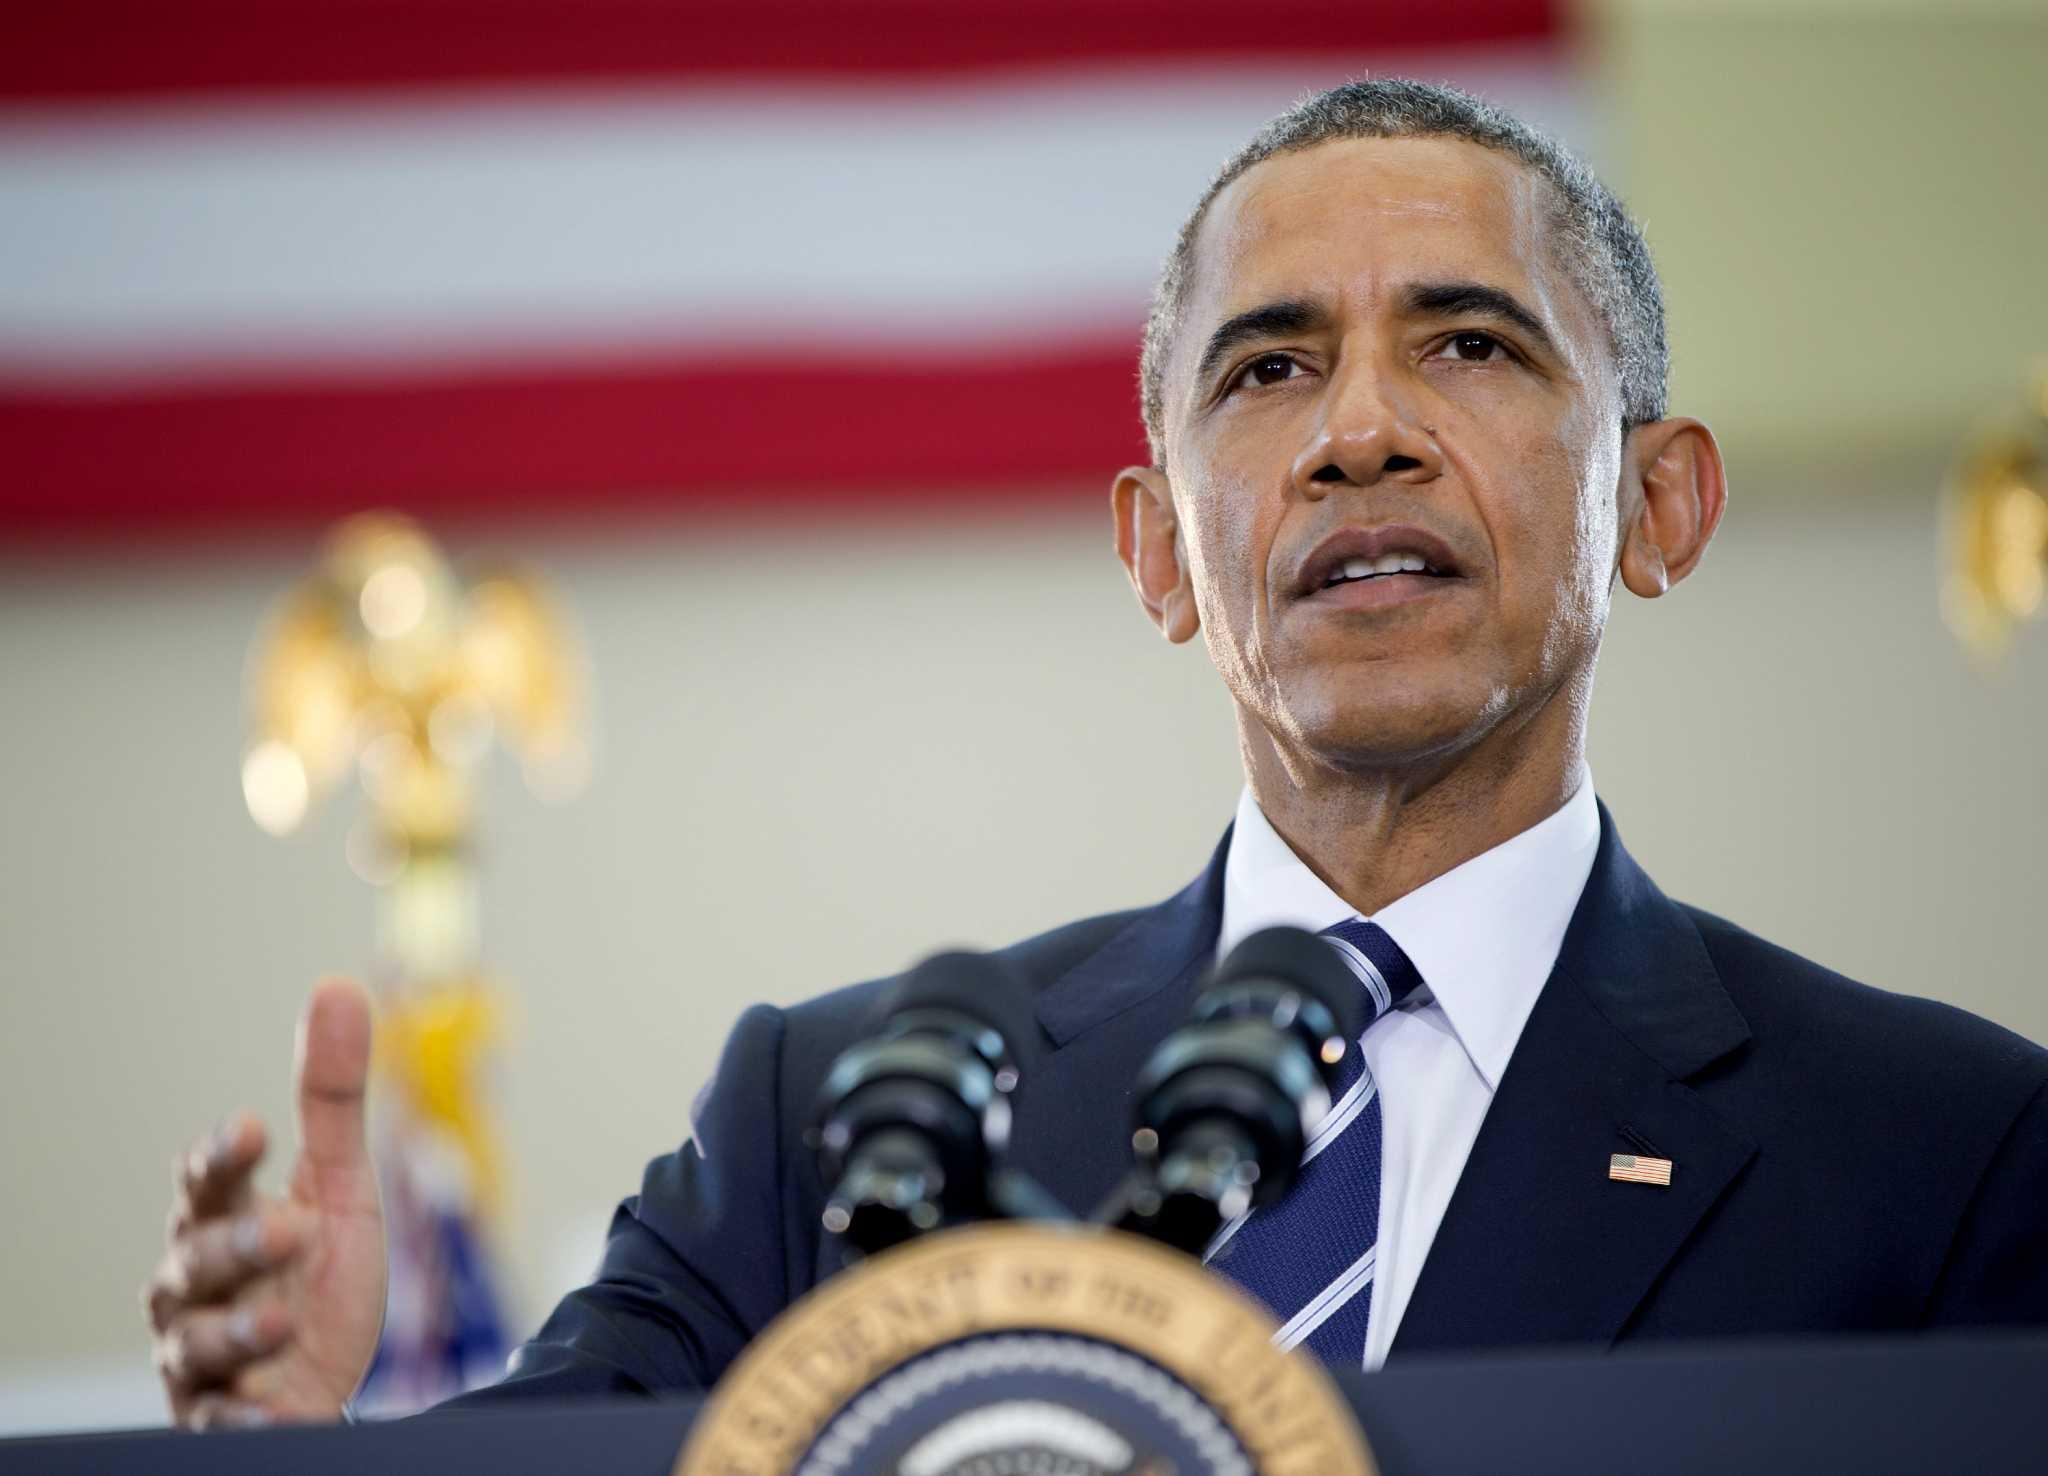 president barack obama speaks - HD2048×1476